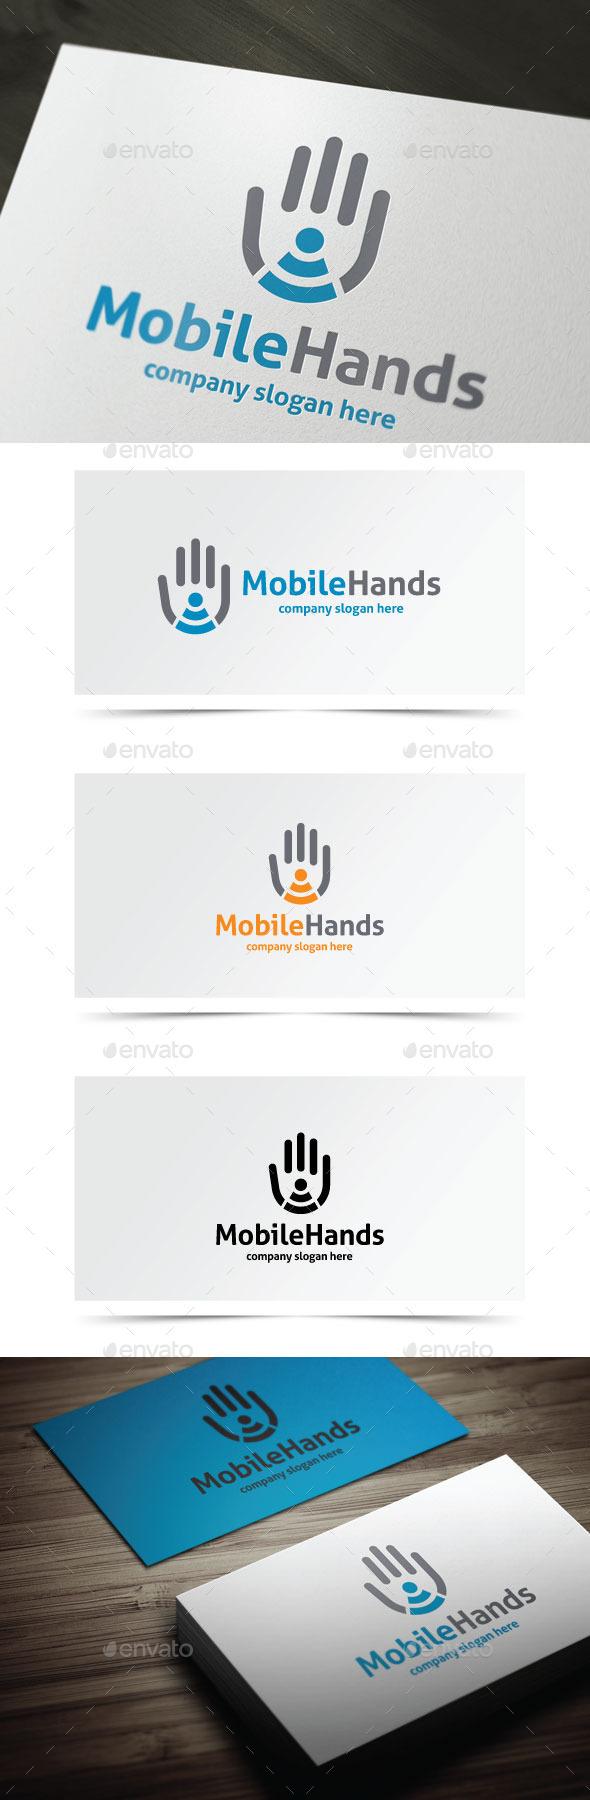 Mobile Hands